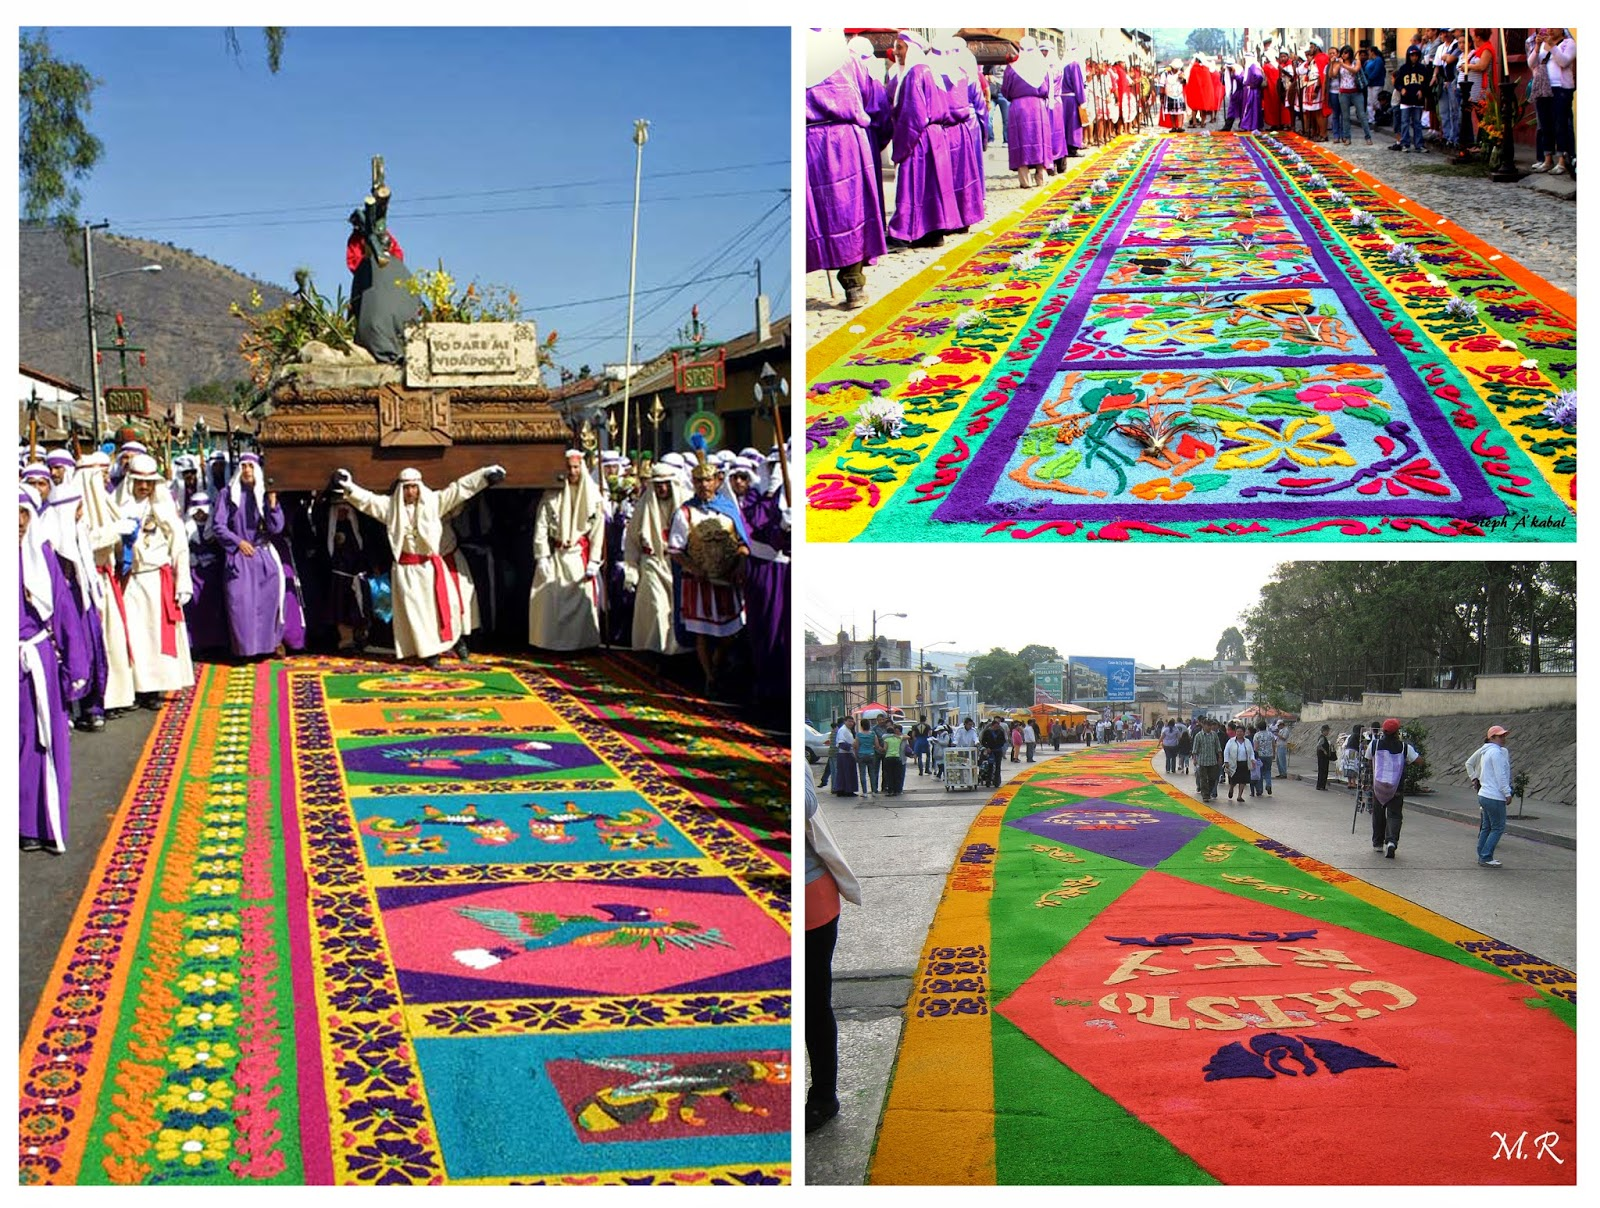 Alfombras de Semana Santa, Guatemala